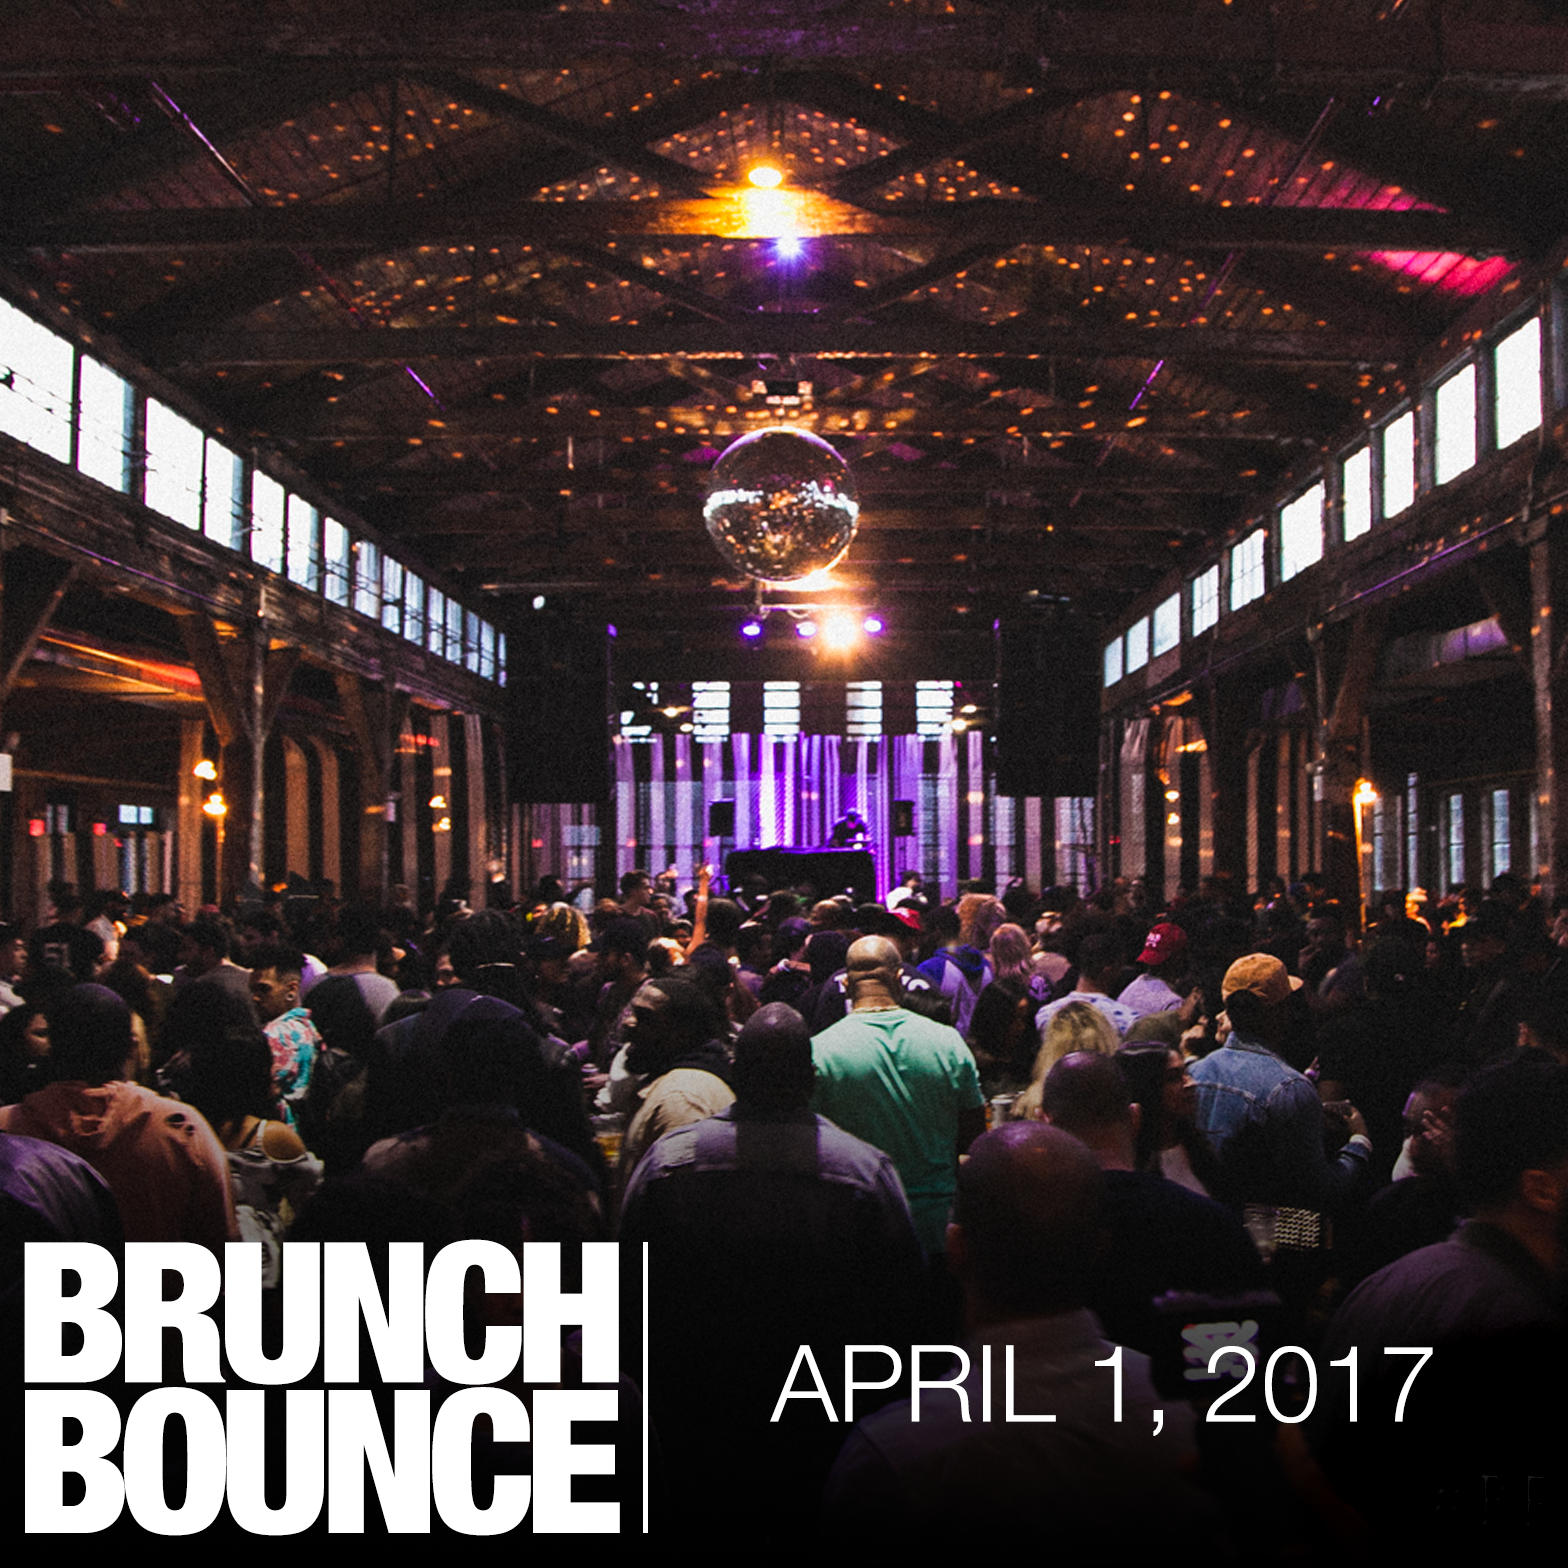 Brunch Bounce 4.1.17